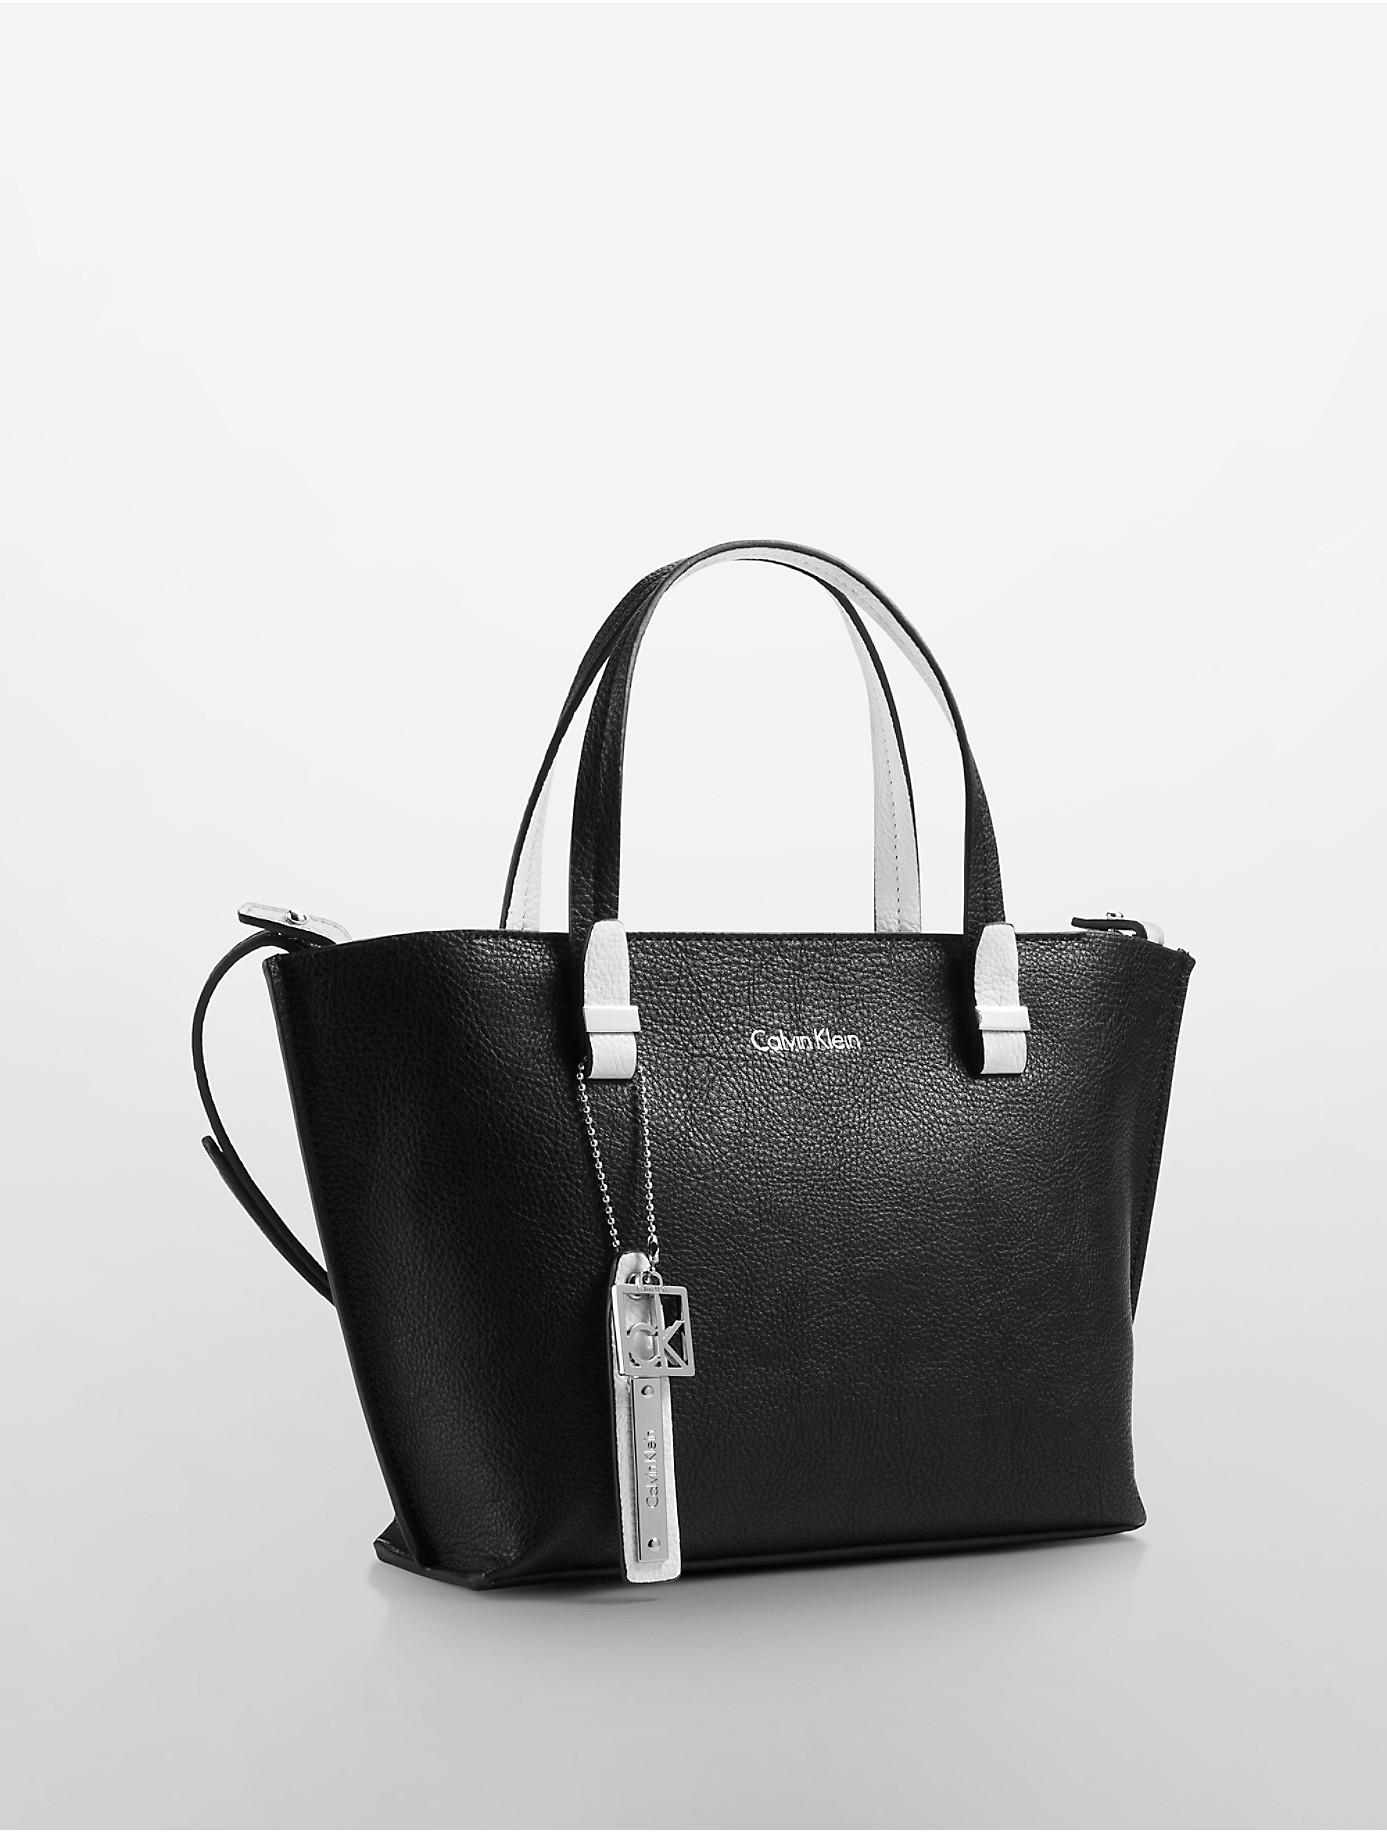 Lyst Calvin Klein White Label Haley Studio Tote In Black